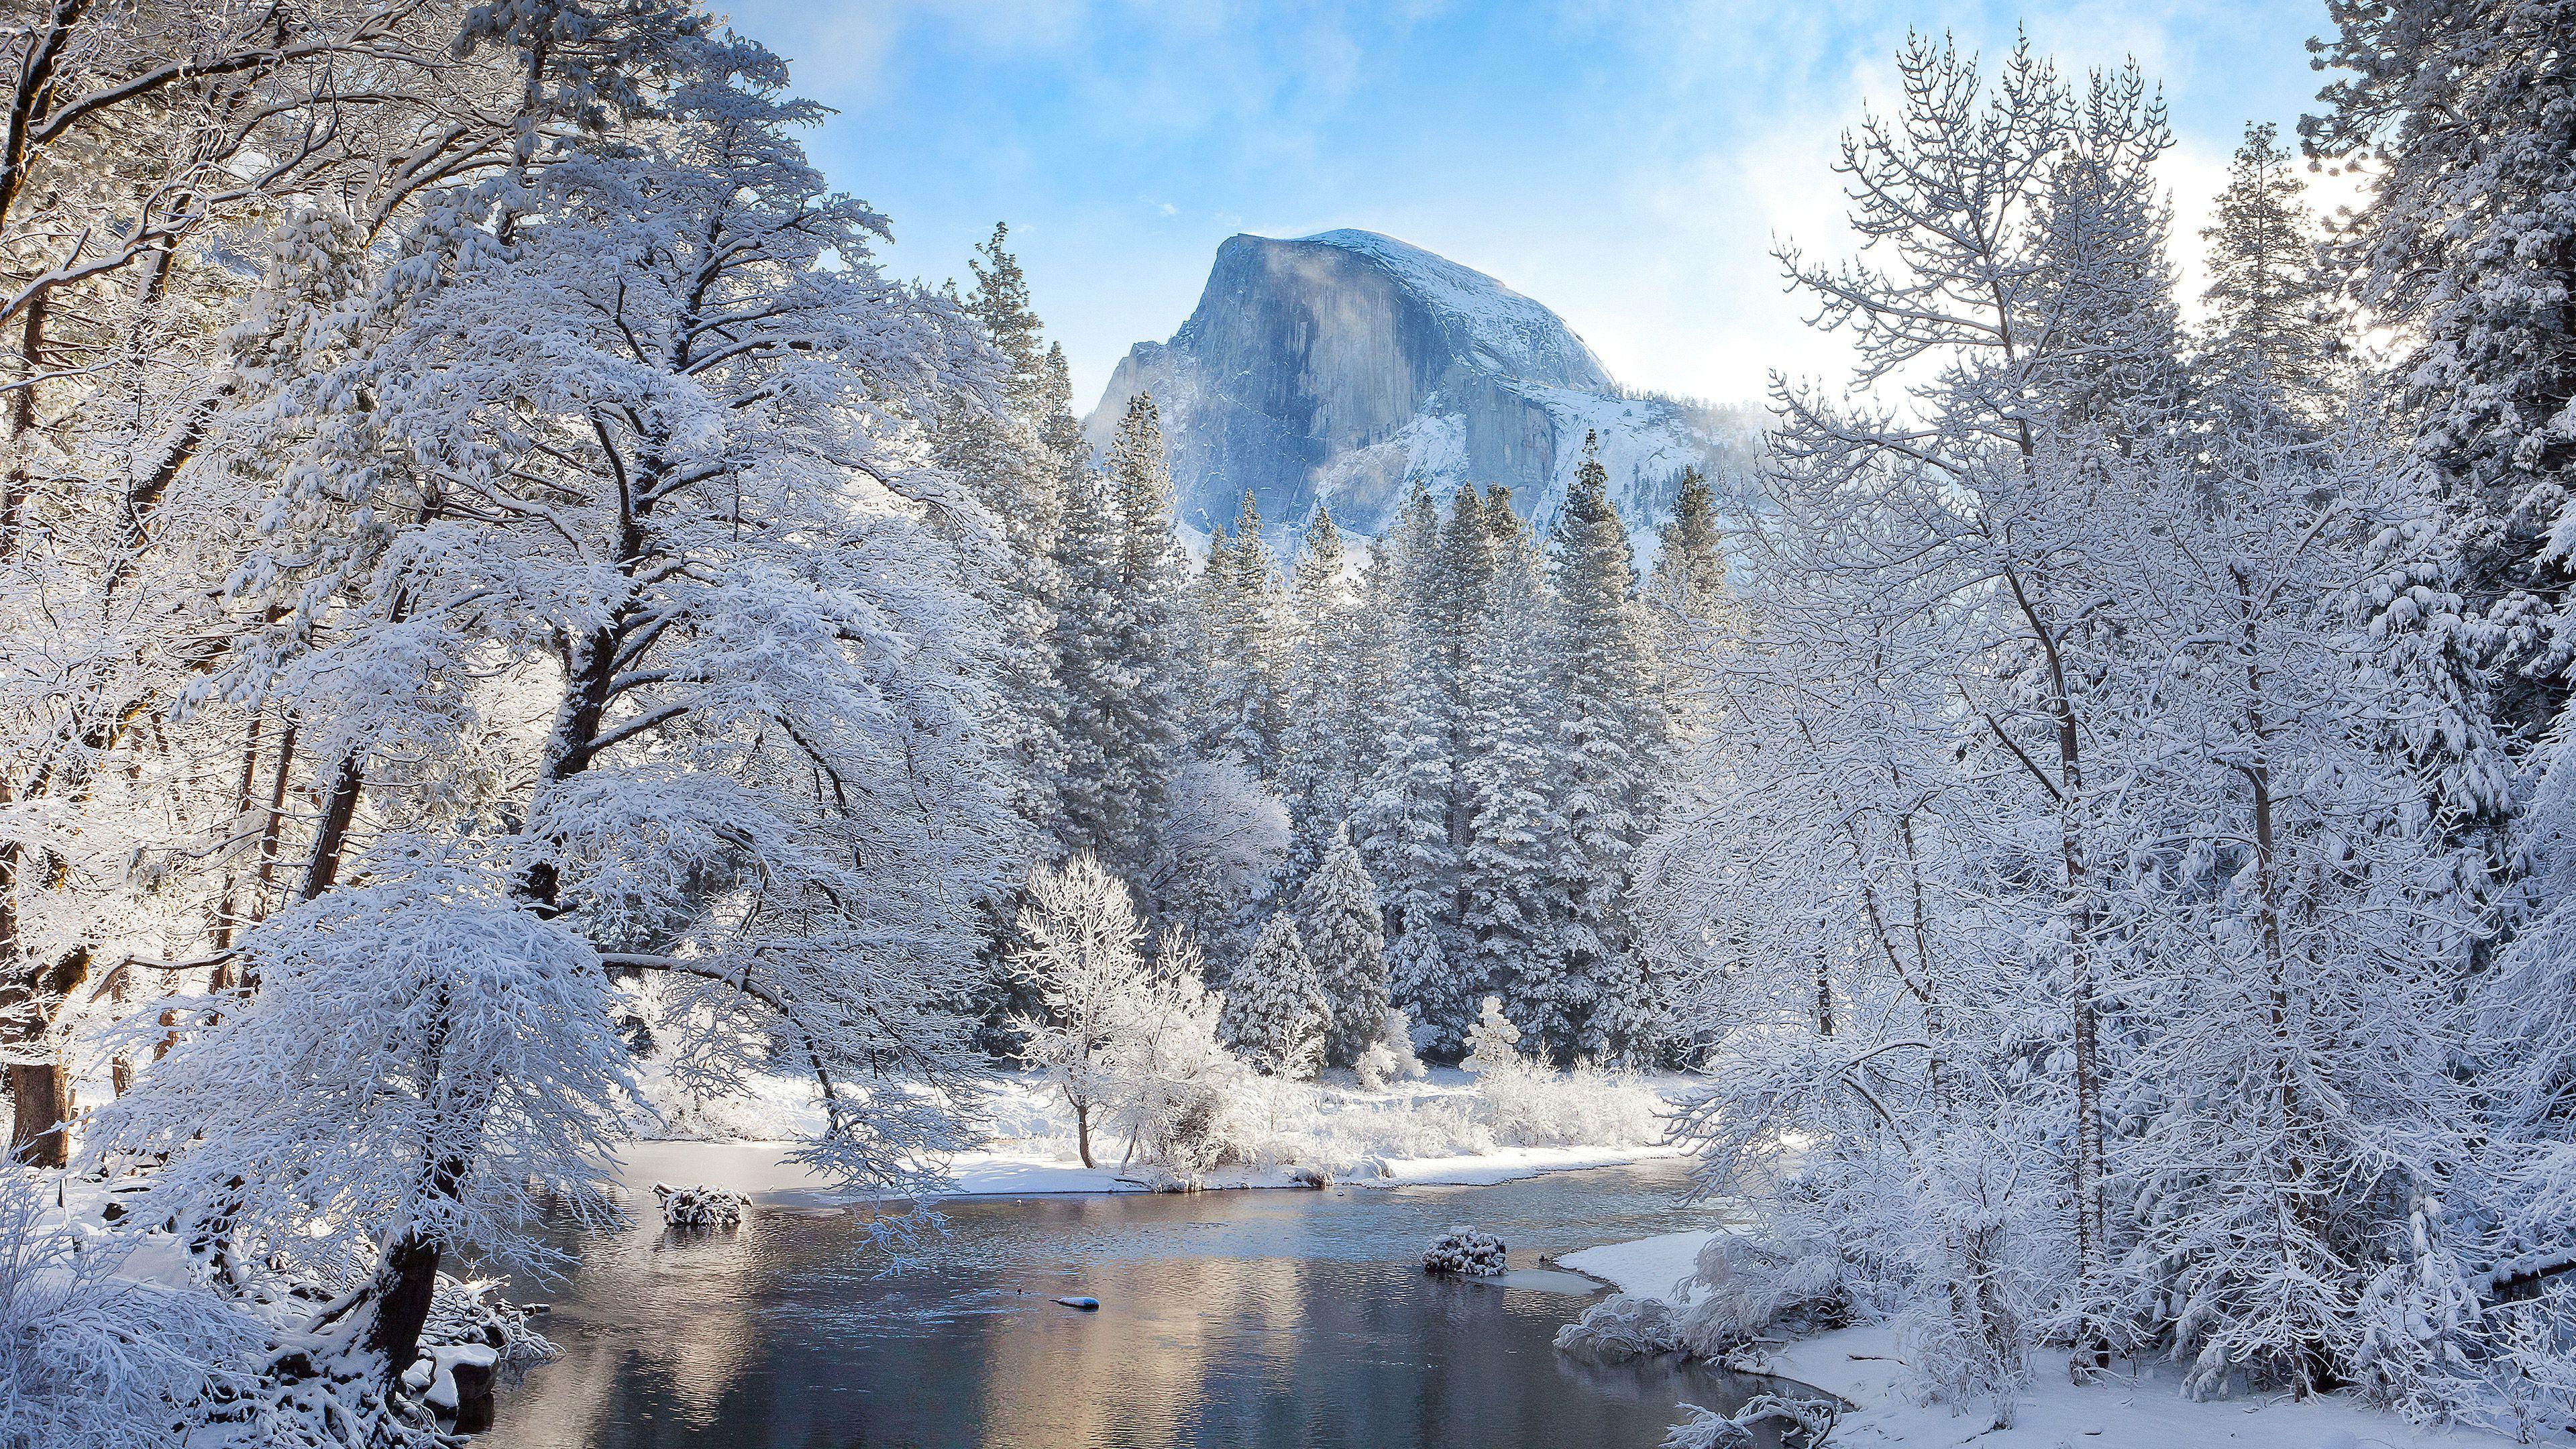 #Yosemite Bridge #Nature #Snow #Miessence #CertifiedOrganic